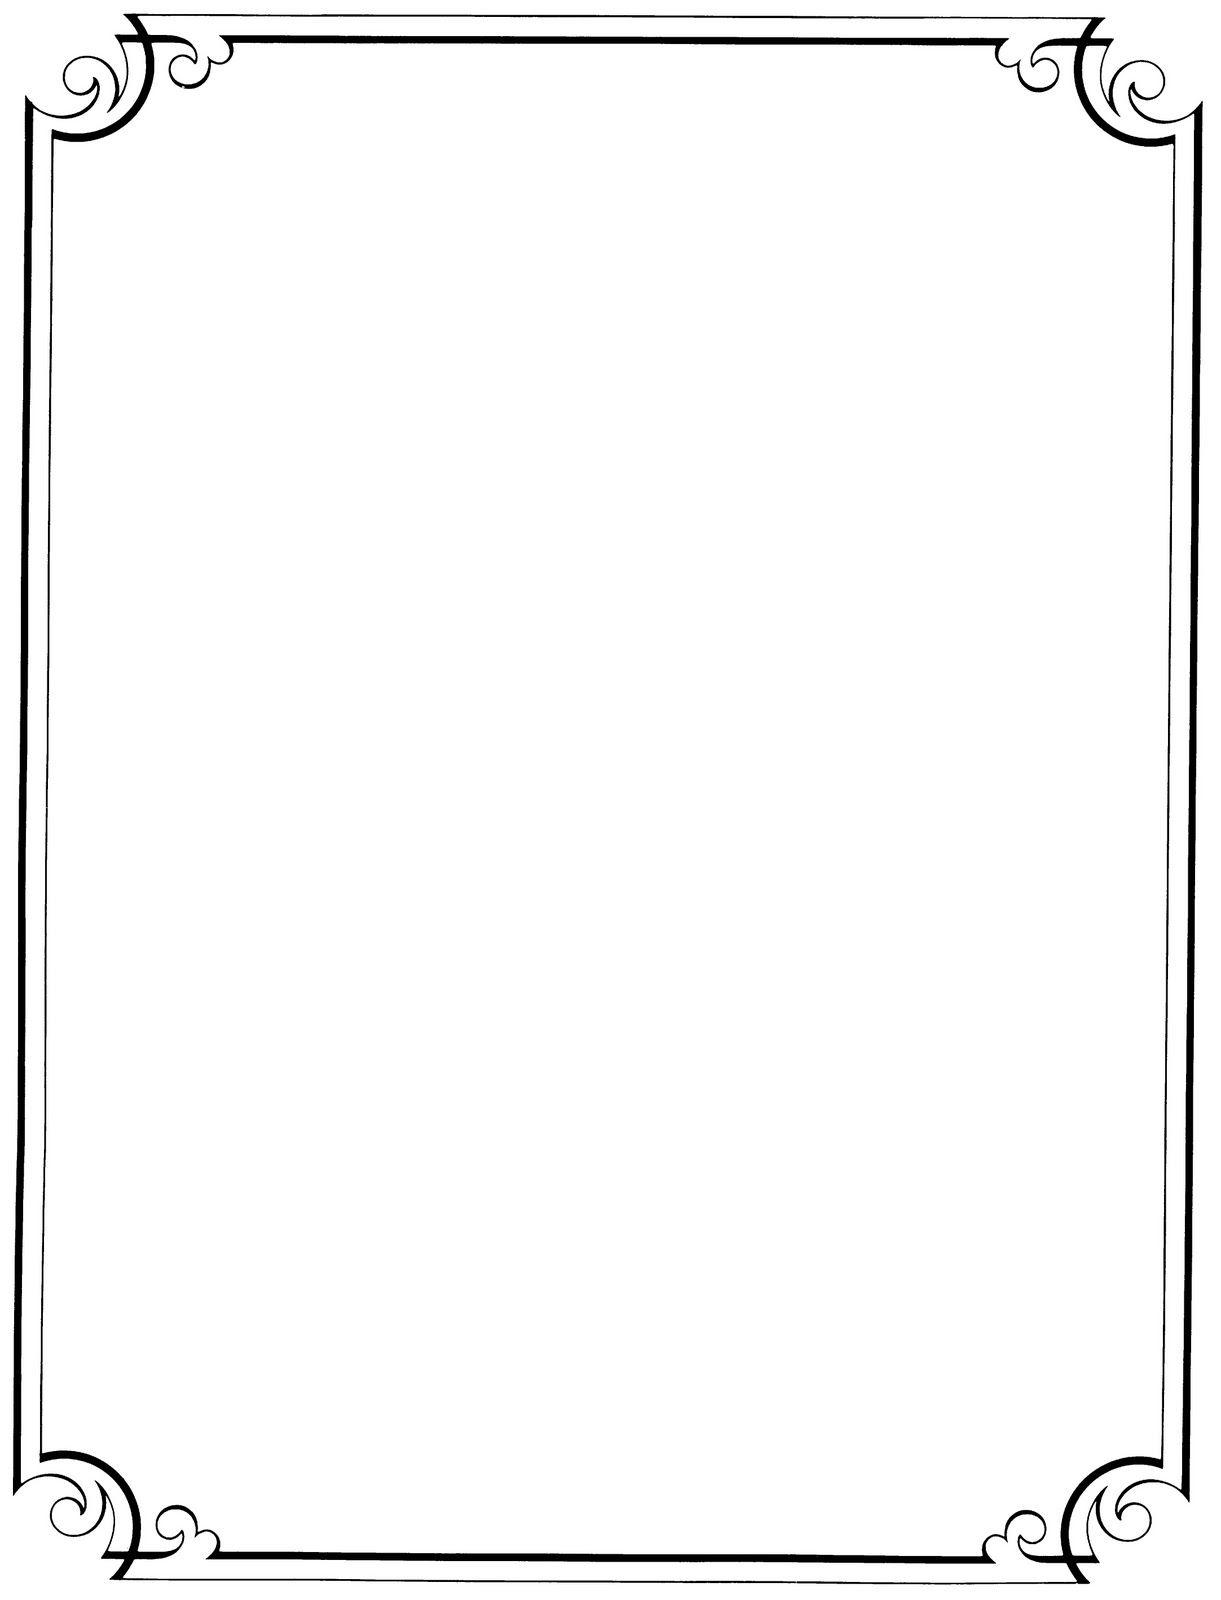 Free Printable Clip Art Borders |  : Free Vintage Clip Art - Free Printable Borders And Frames